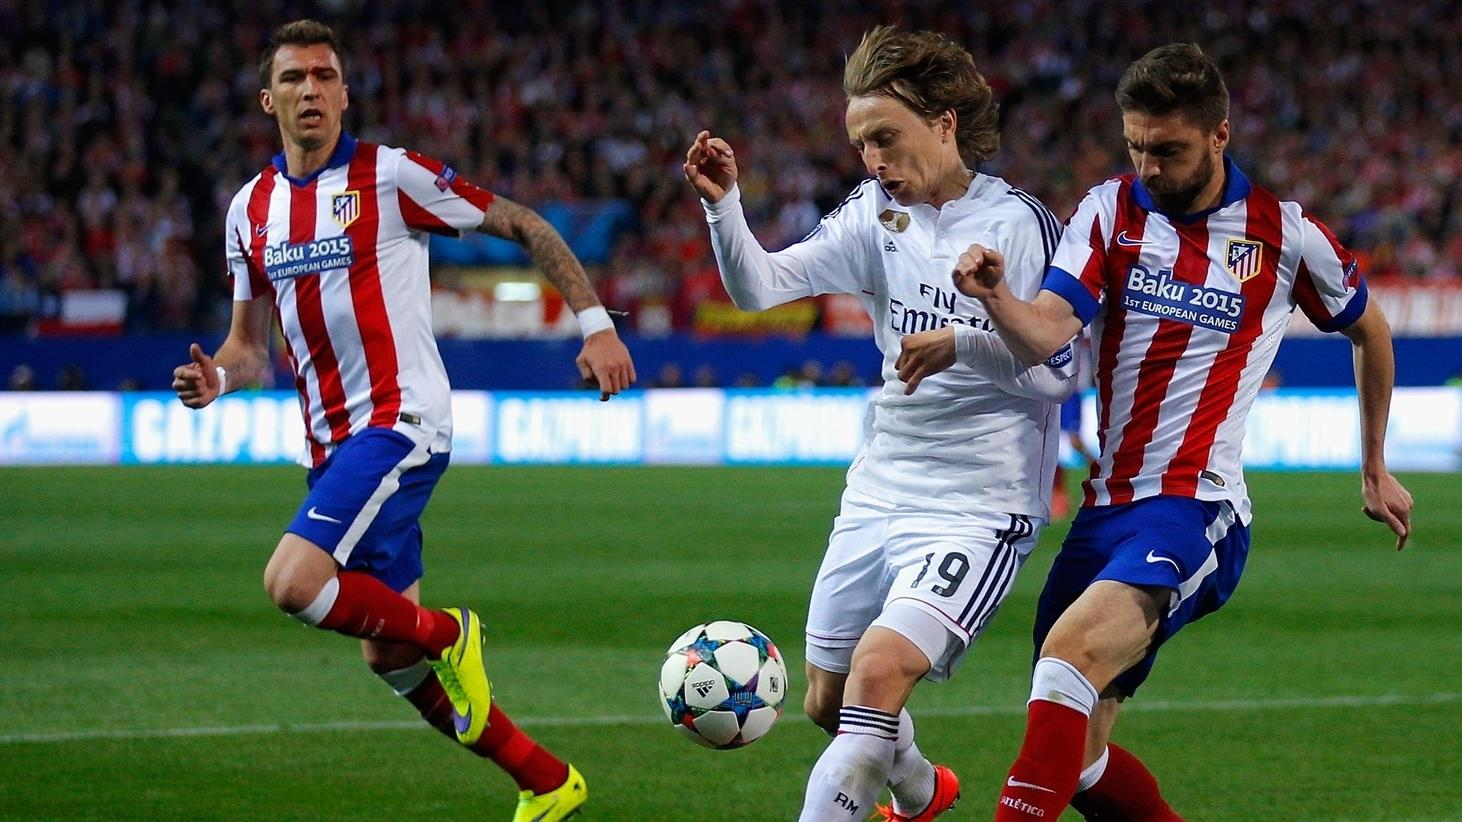 Match Attax Liga de Campeones 18//19 Atlético Madrid 18 Tarjeta Equipo Set-Completo